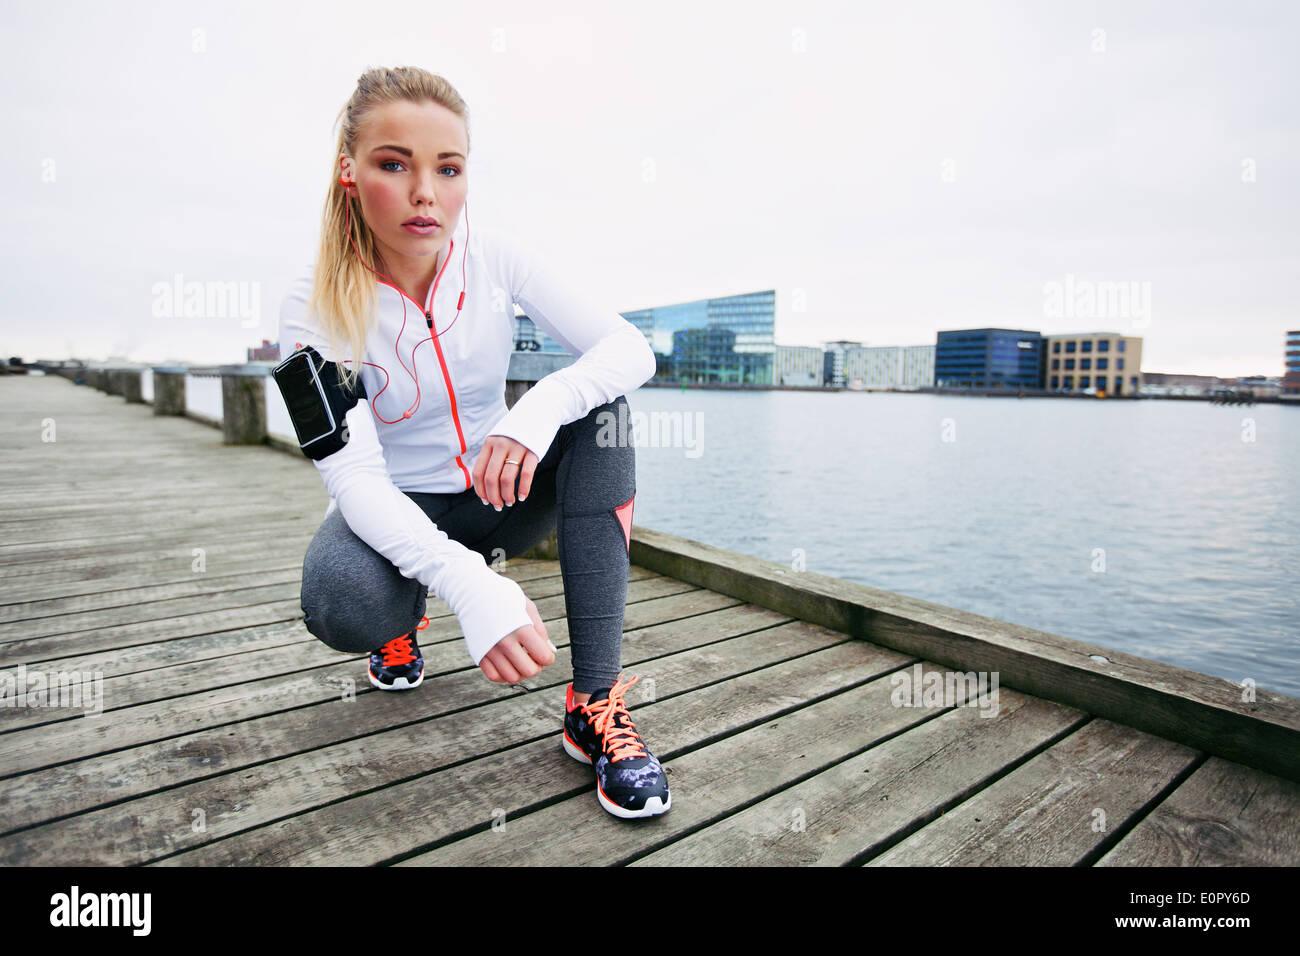 Junge Frau Läufer Erholung nach dem Training ausführen. Frauen Fitness-Modell hockend auf Bürgersteig entlang. Weibliche Jogger ruht. Stockbild